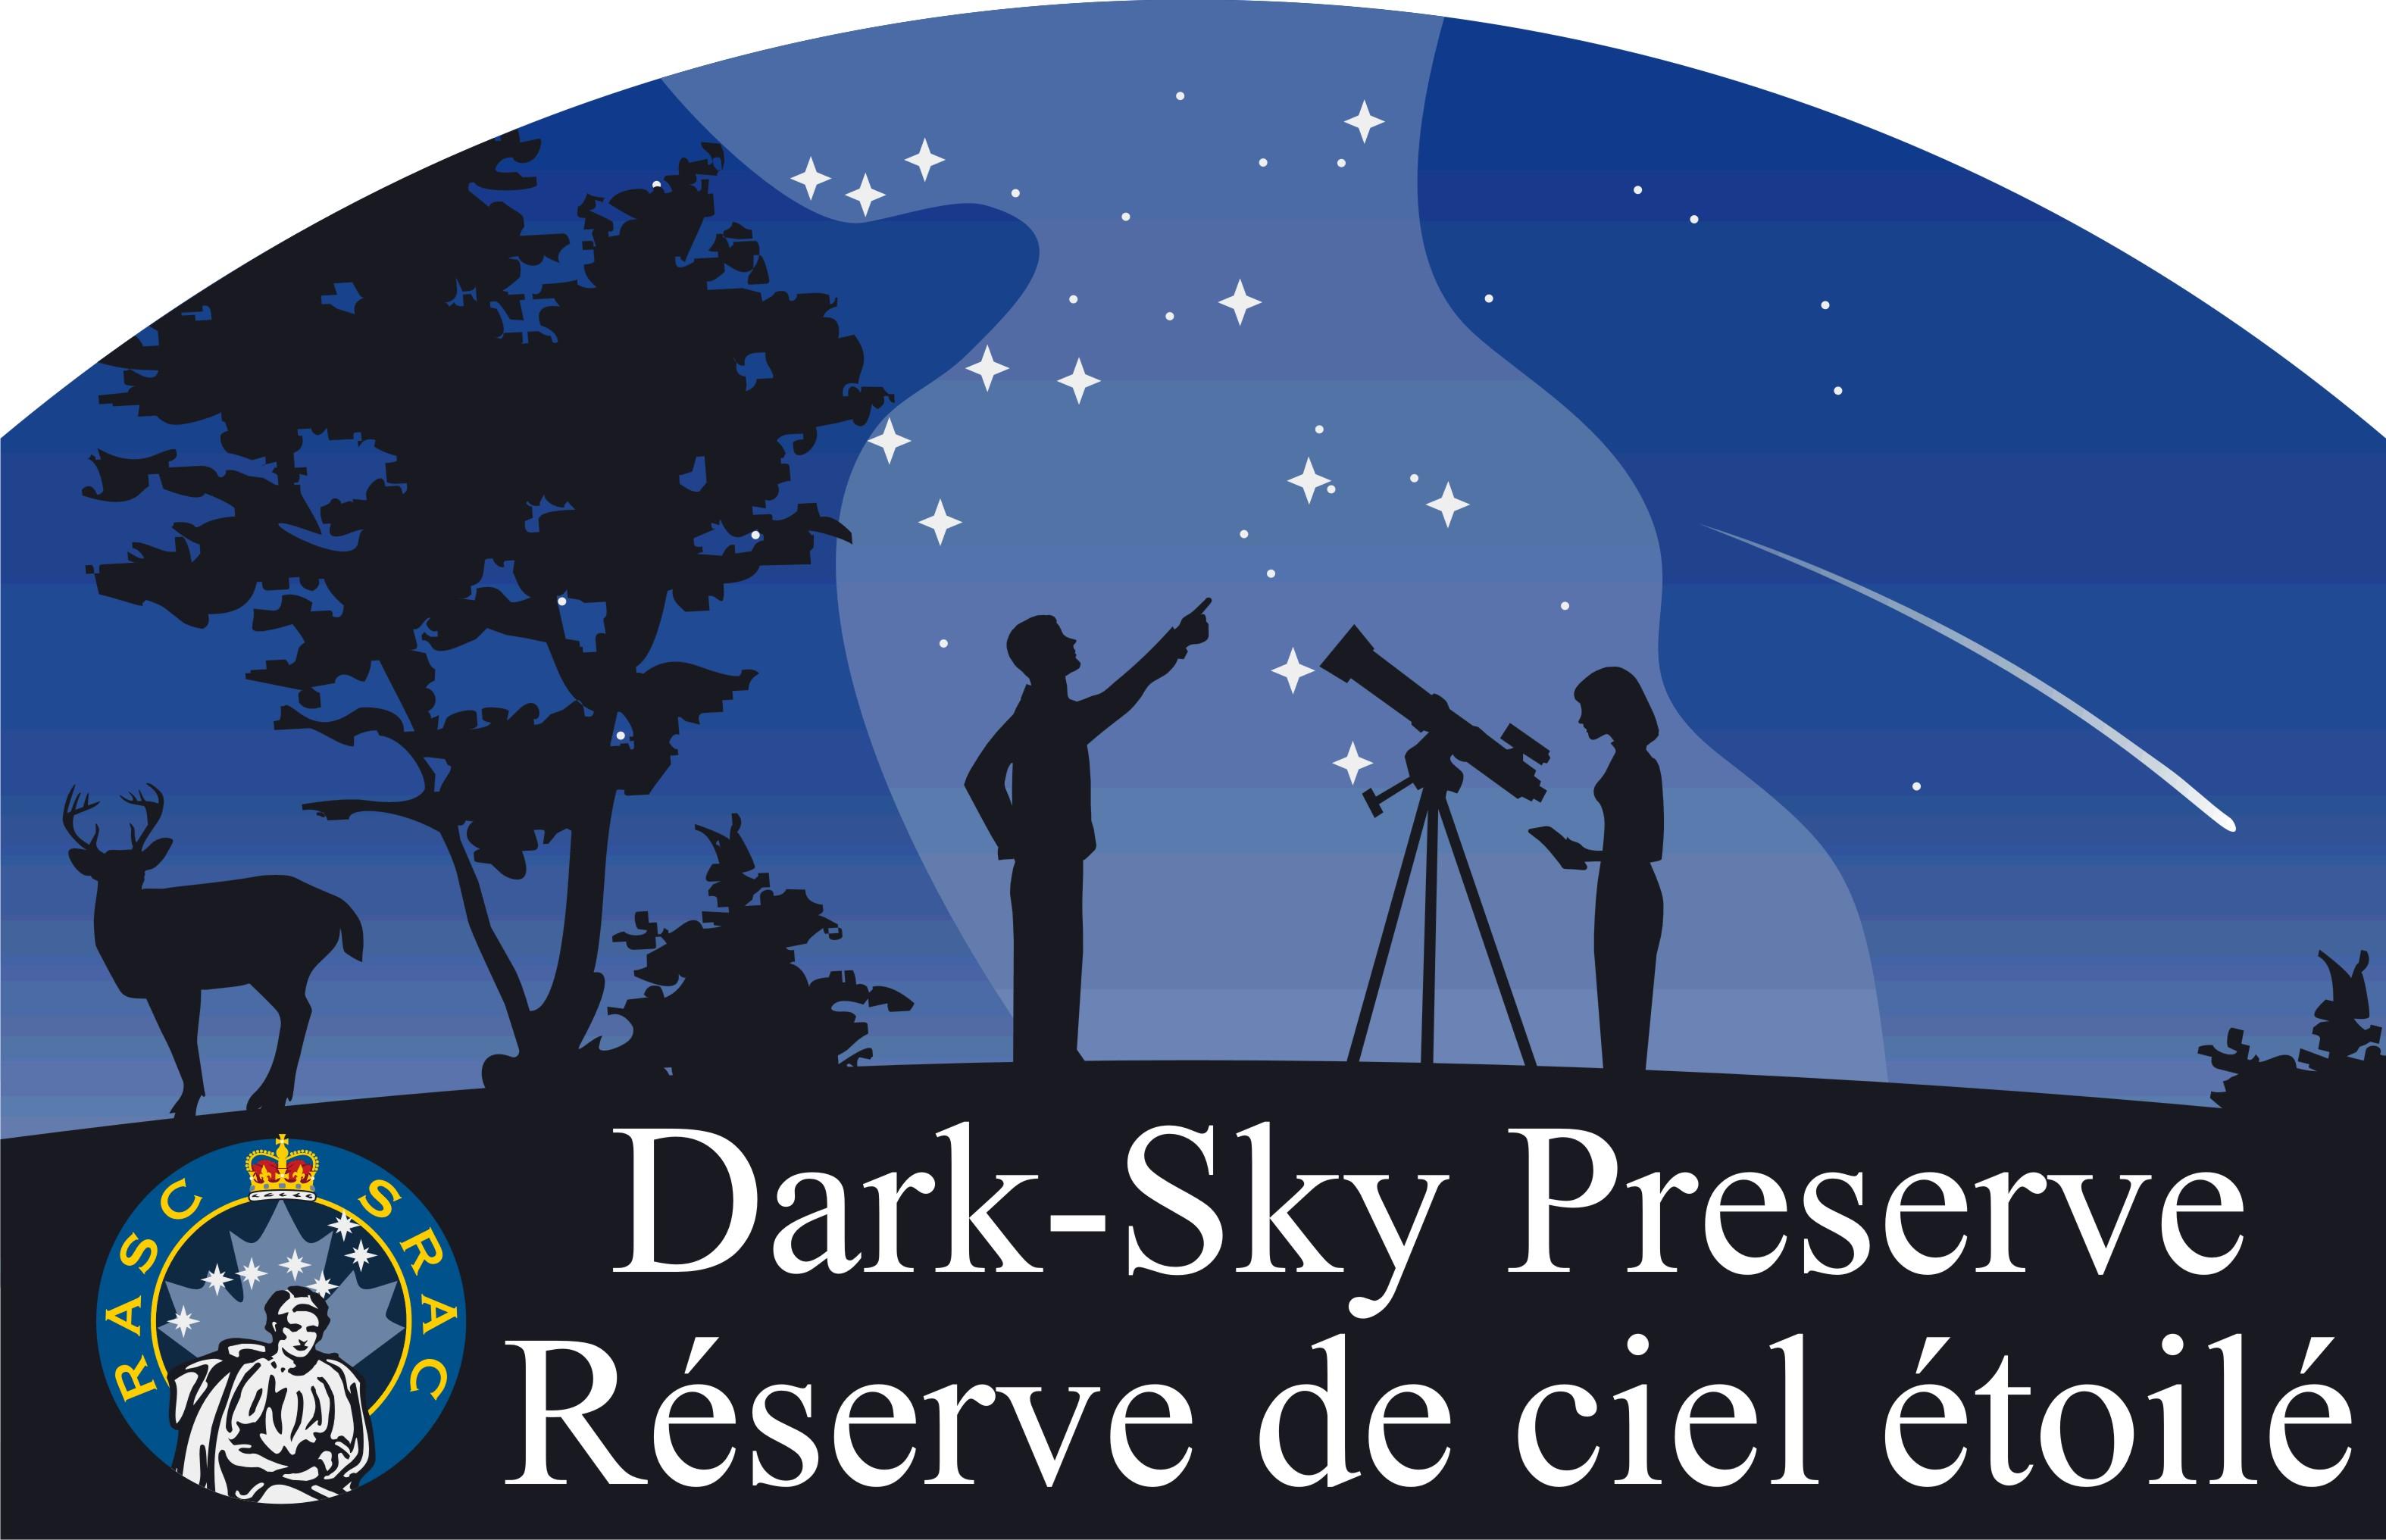 Dark-Sky Site Designations | RASC